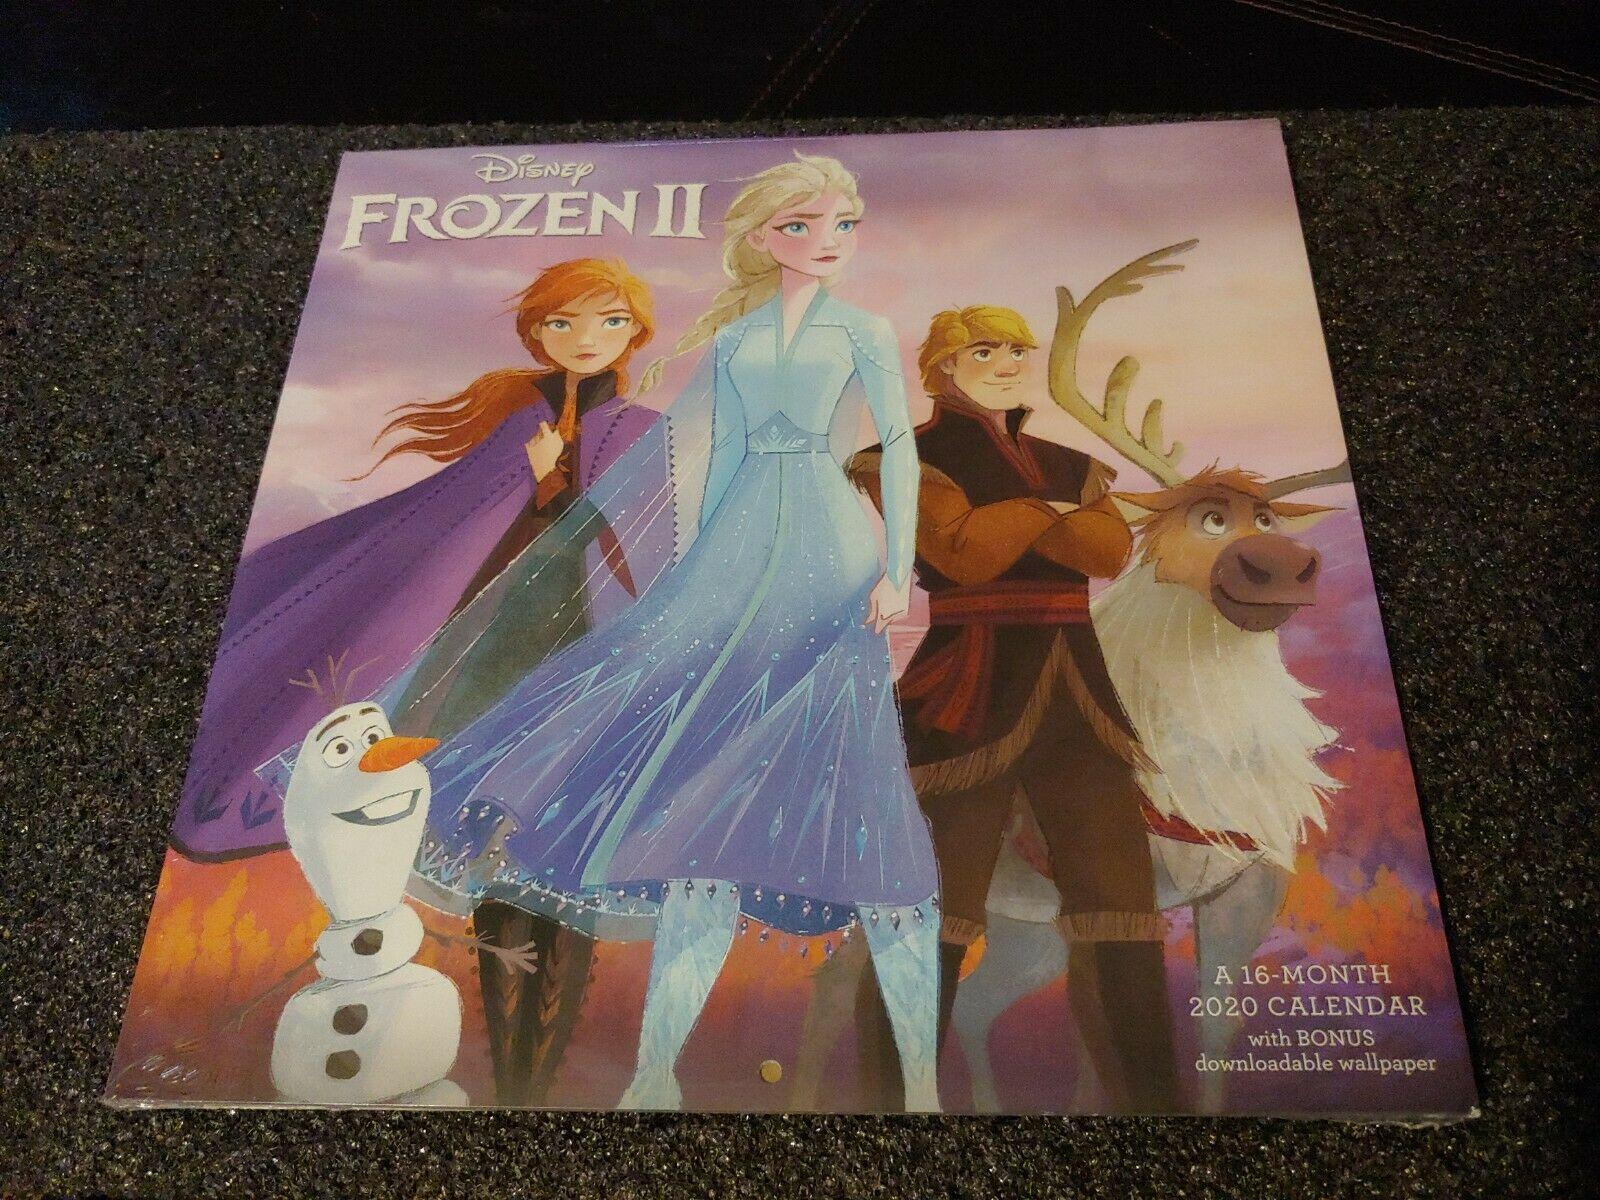 Acco Brands 2020 Frozen 2 Wall Calendar + Downloadable Wallpaper Disney